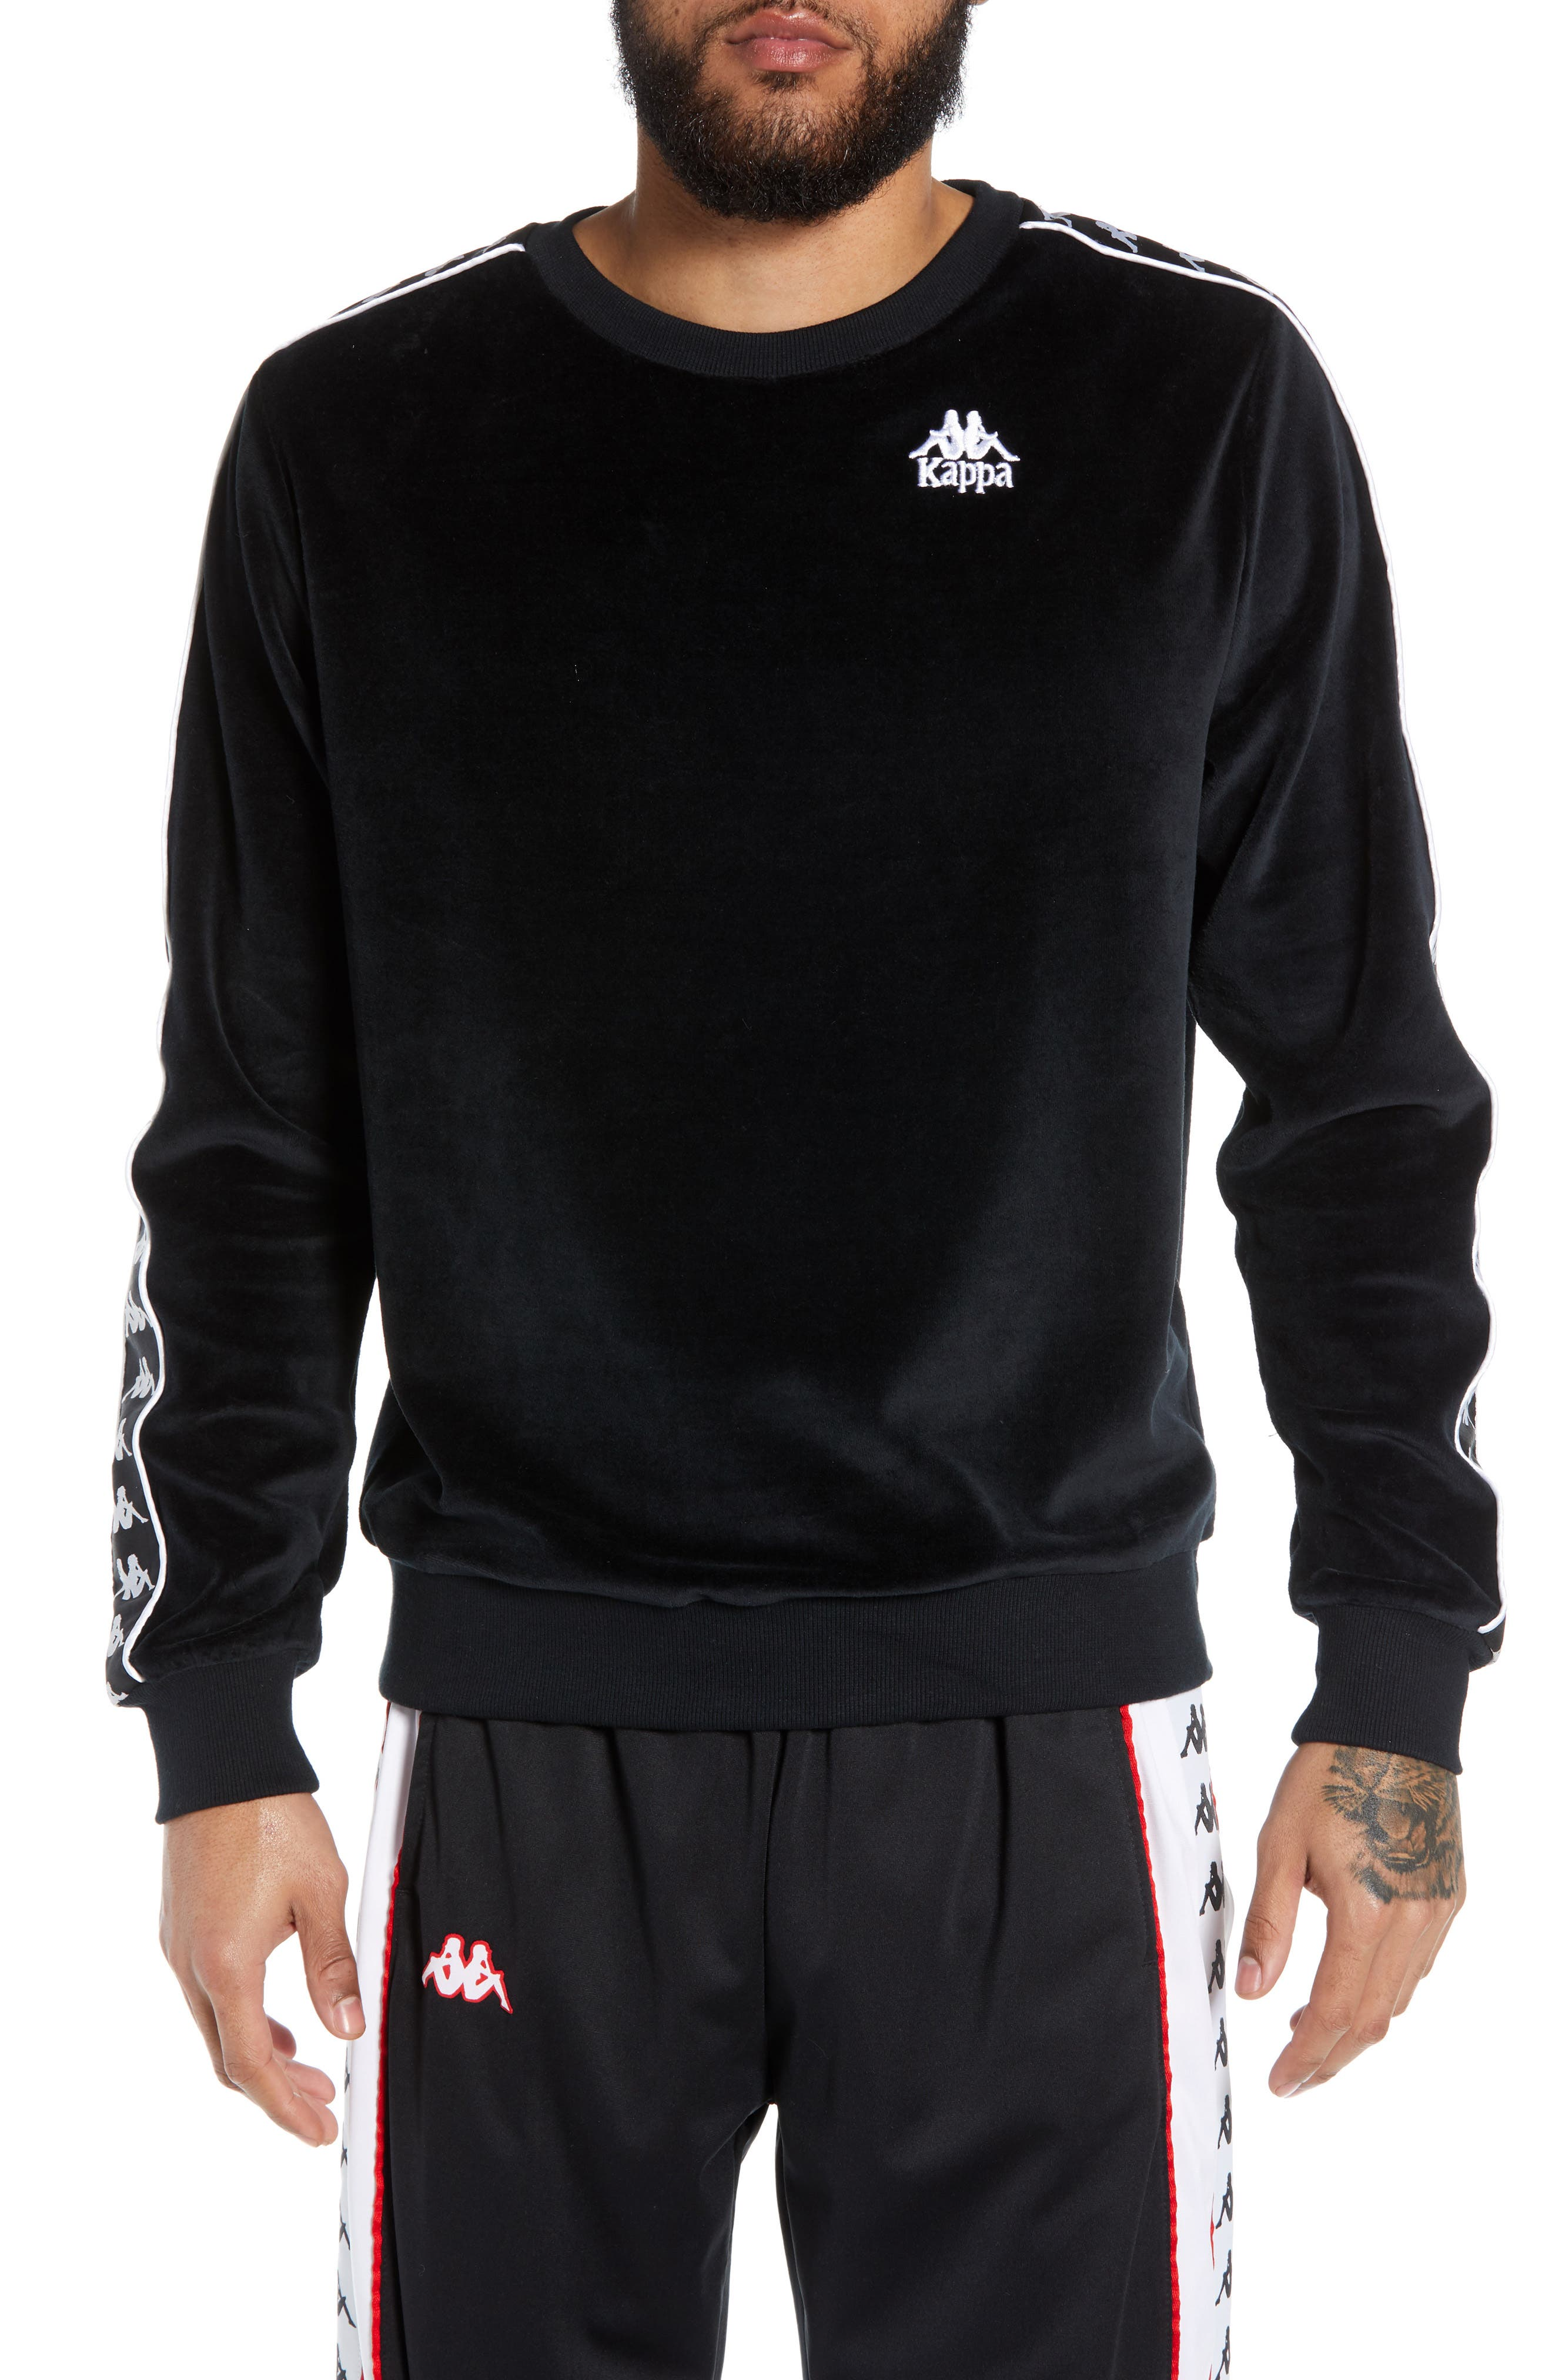 KAPPA Authentic Aynset Velour Crewneck Sweatshirt, Main, color, 001